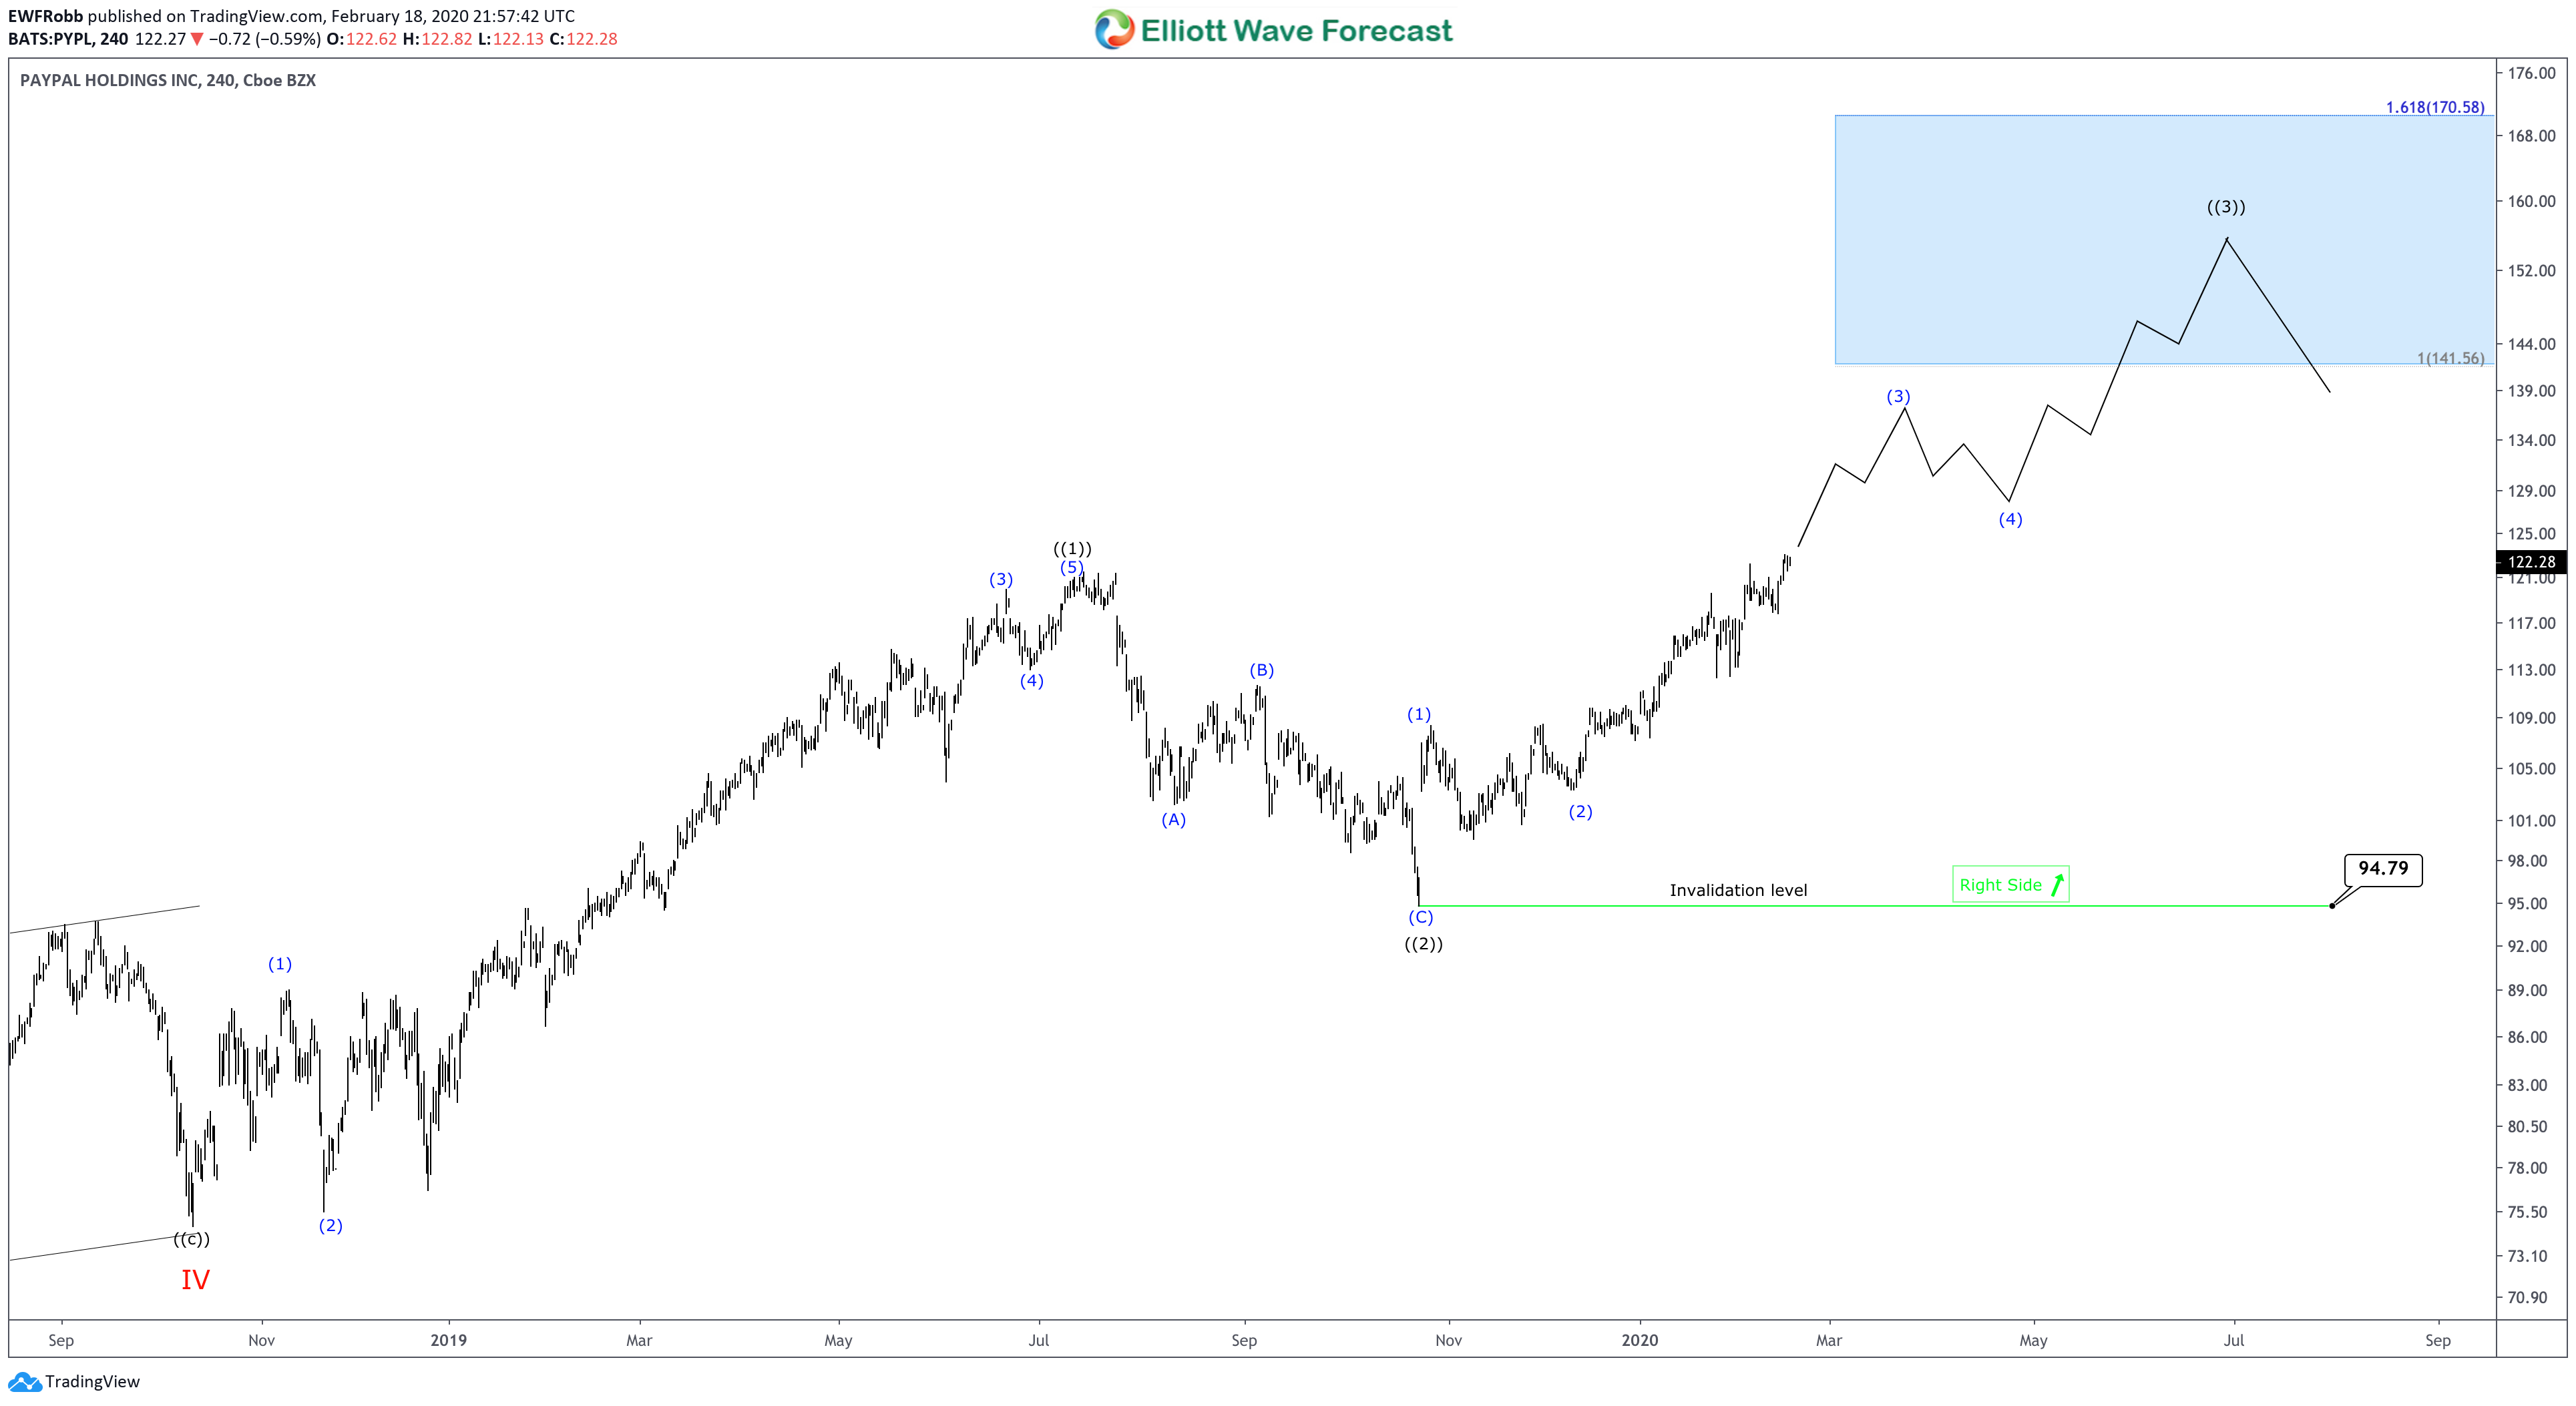 Elliott Wave View: PayPal (PYPL) Right Side Remains Bullish